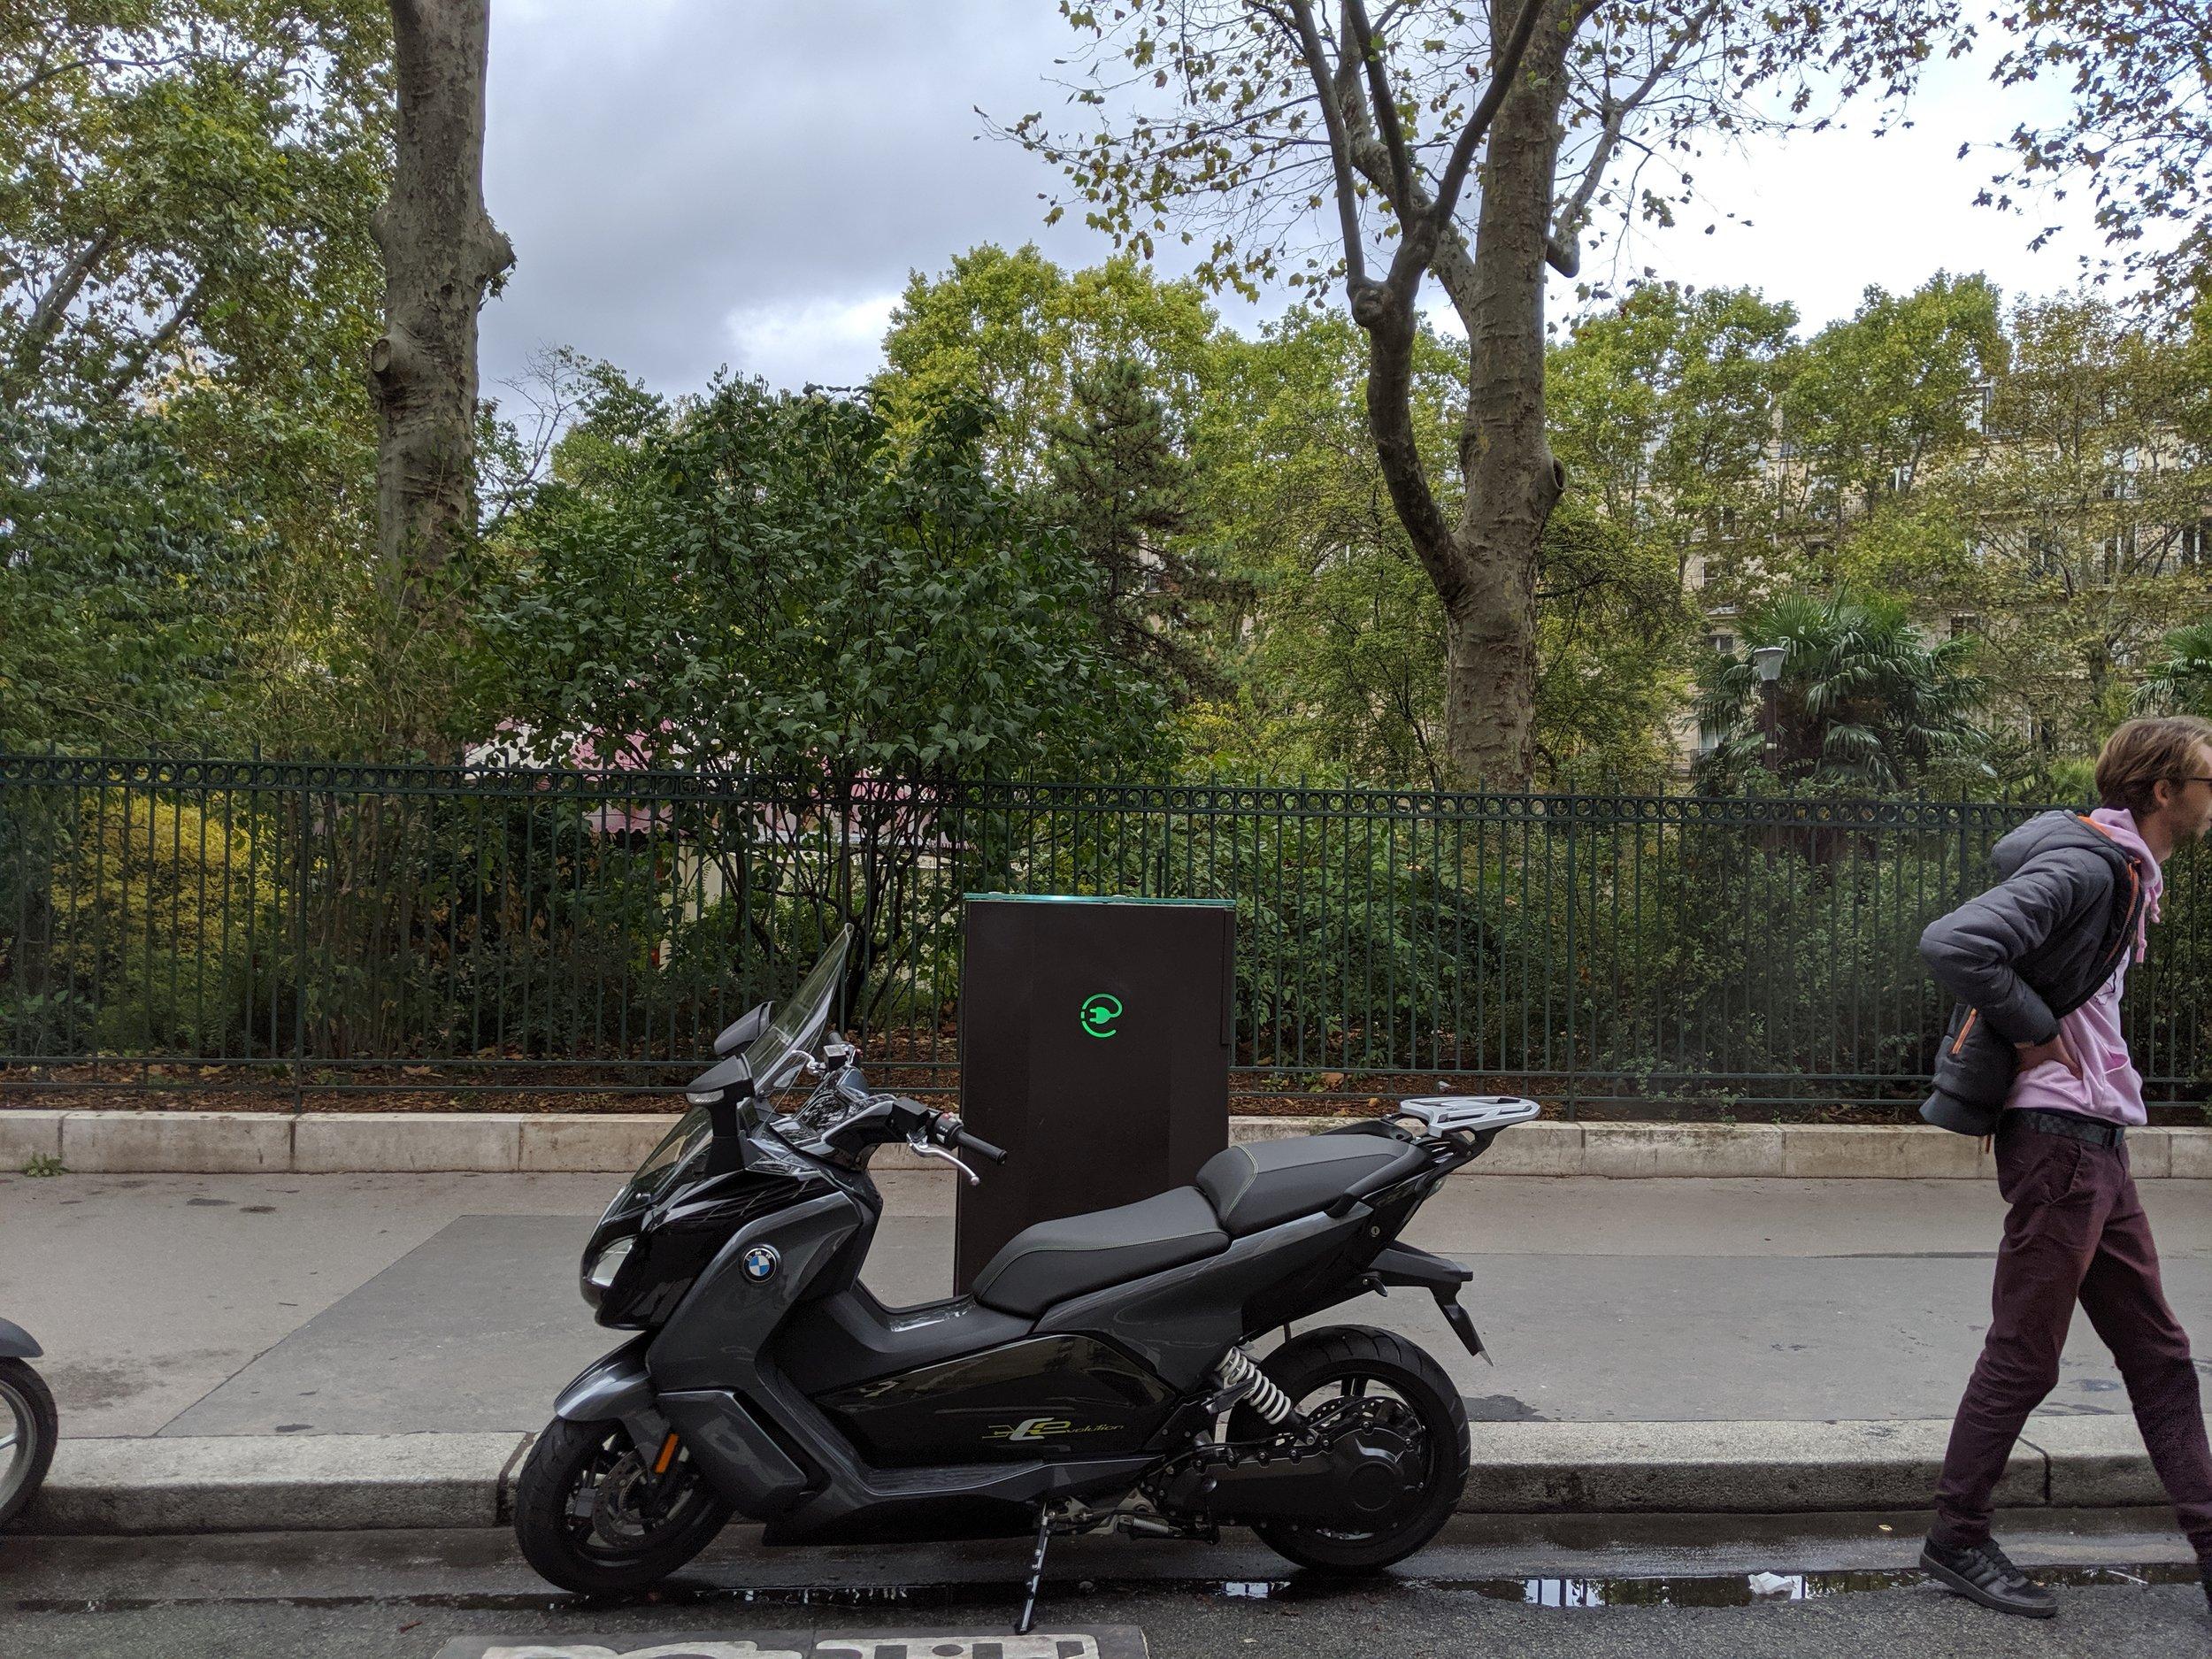 The big BMW seller in Paris!